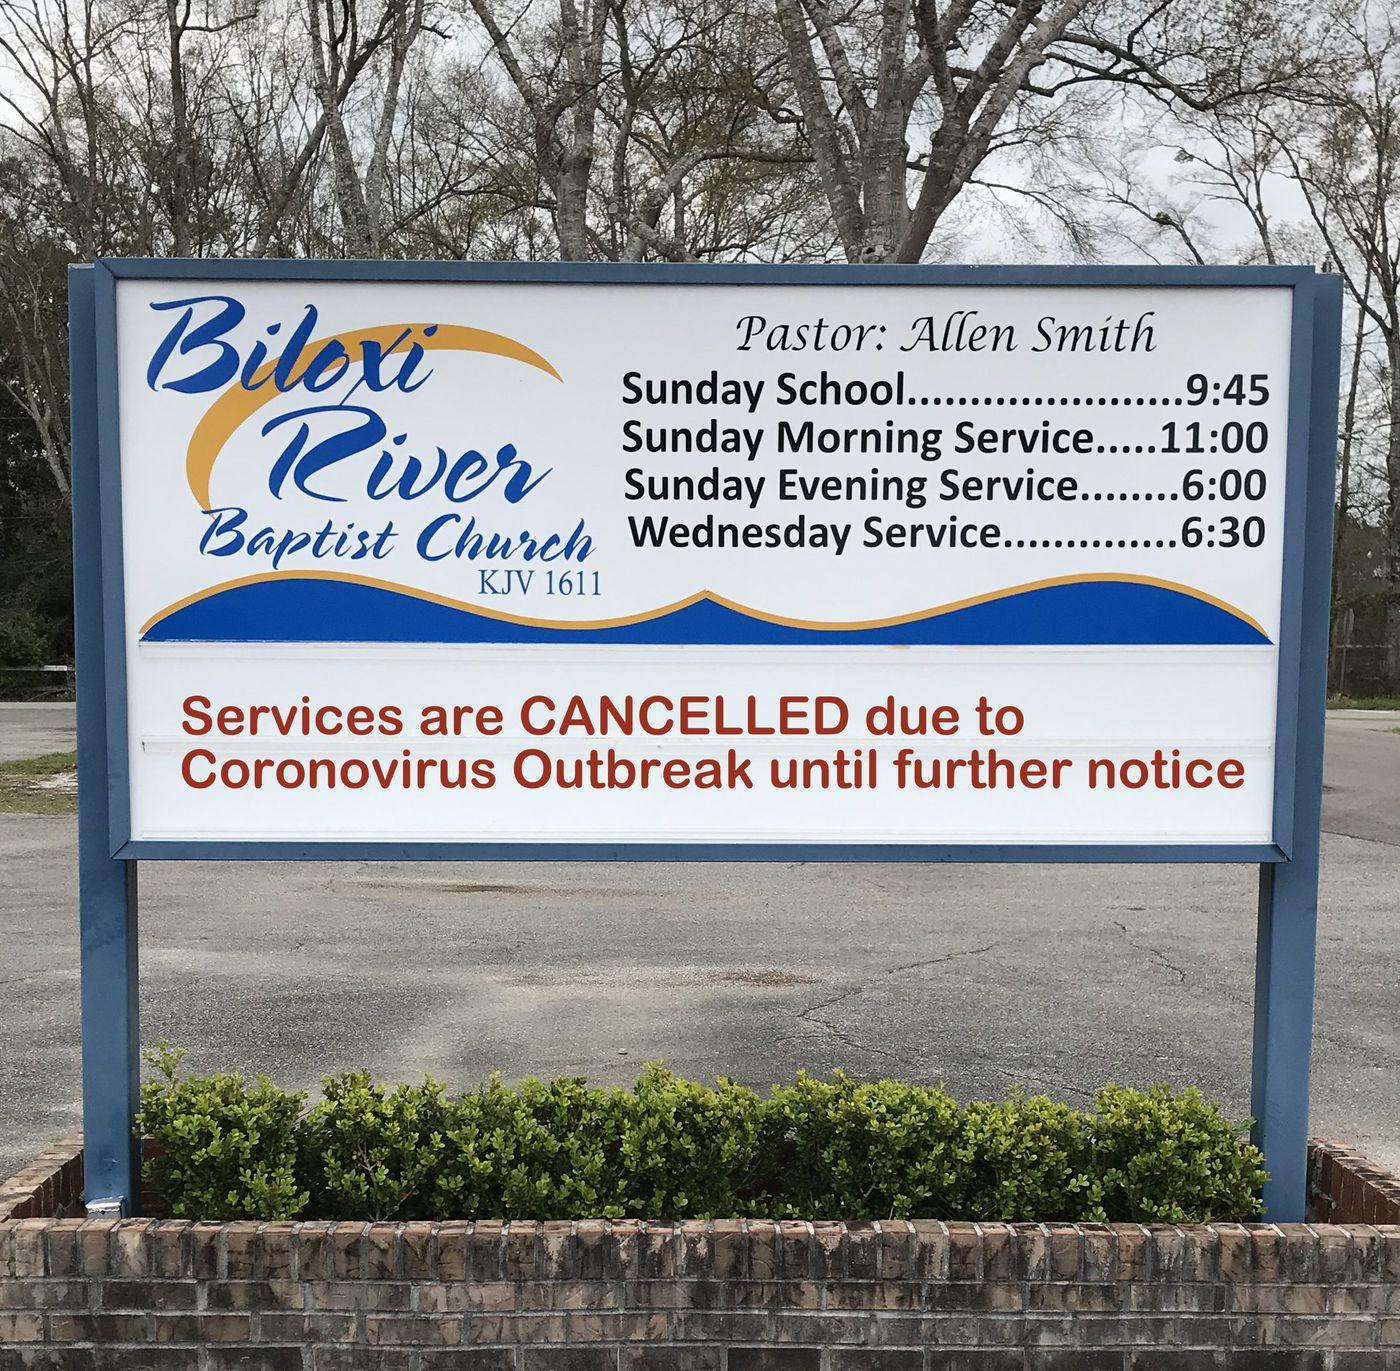 Biloxi River Baptist